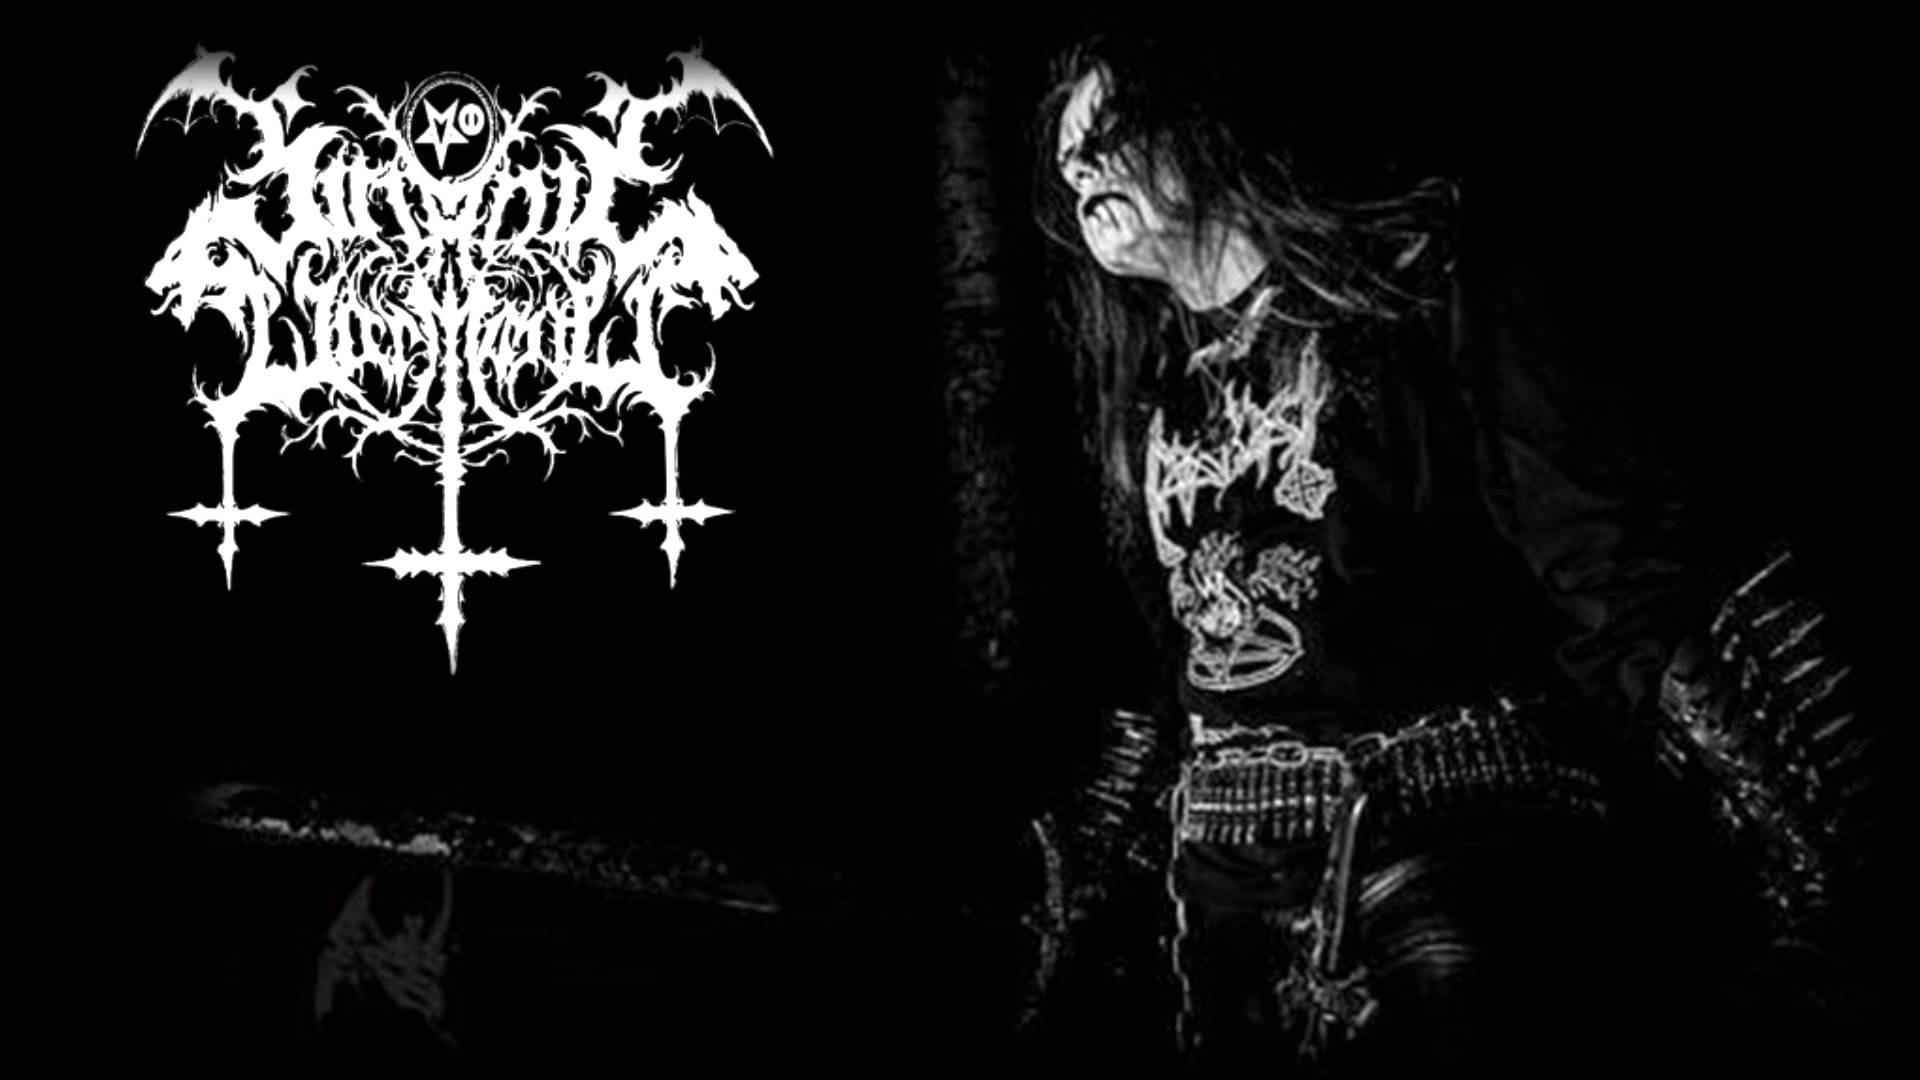 Black metal wallpaper - Black metal wallpaper ...